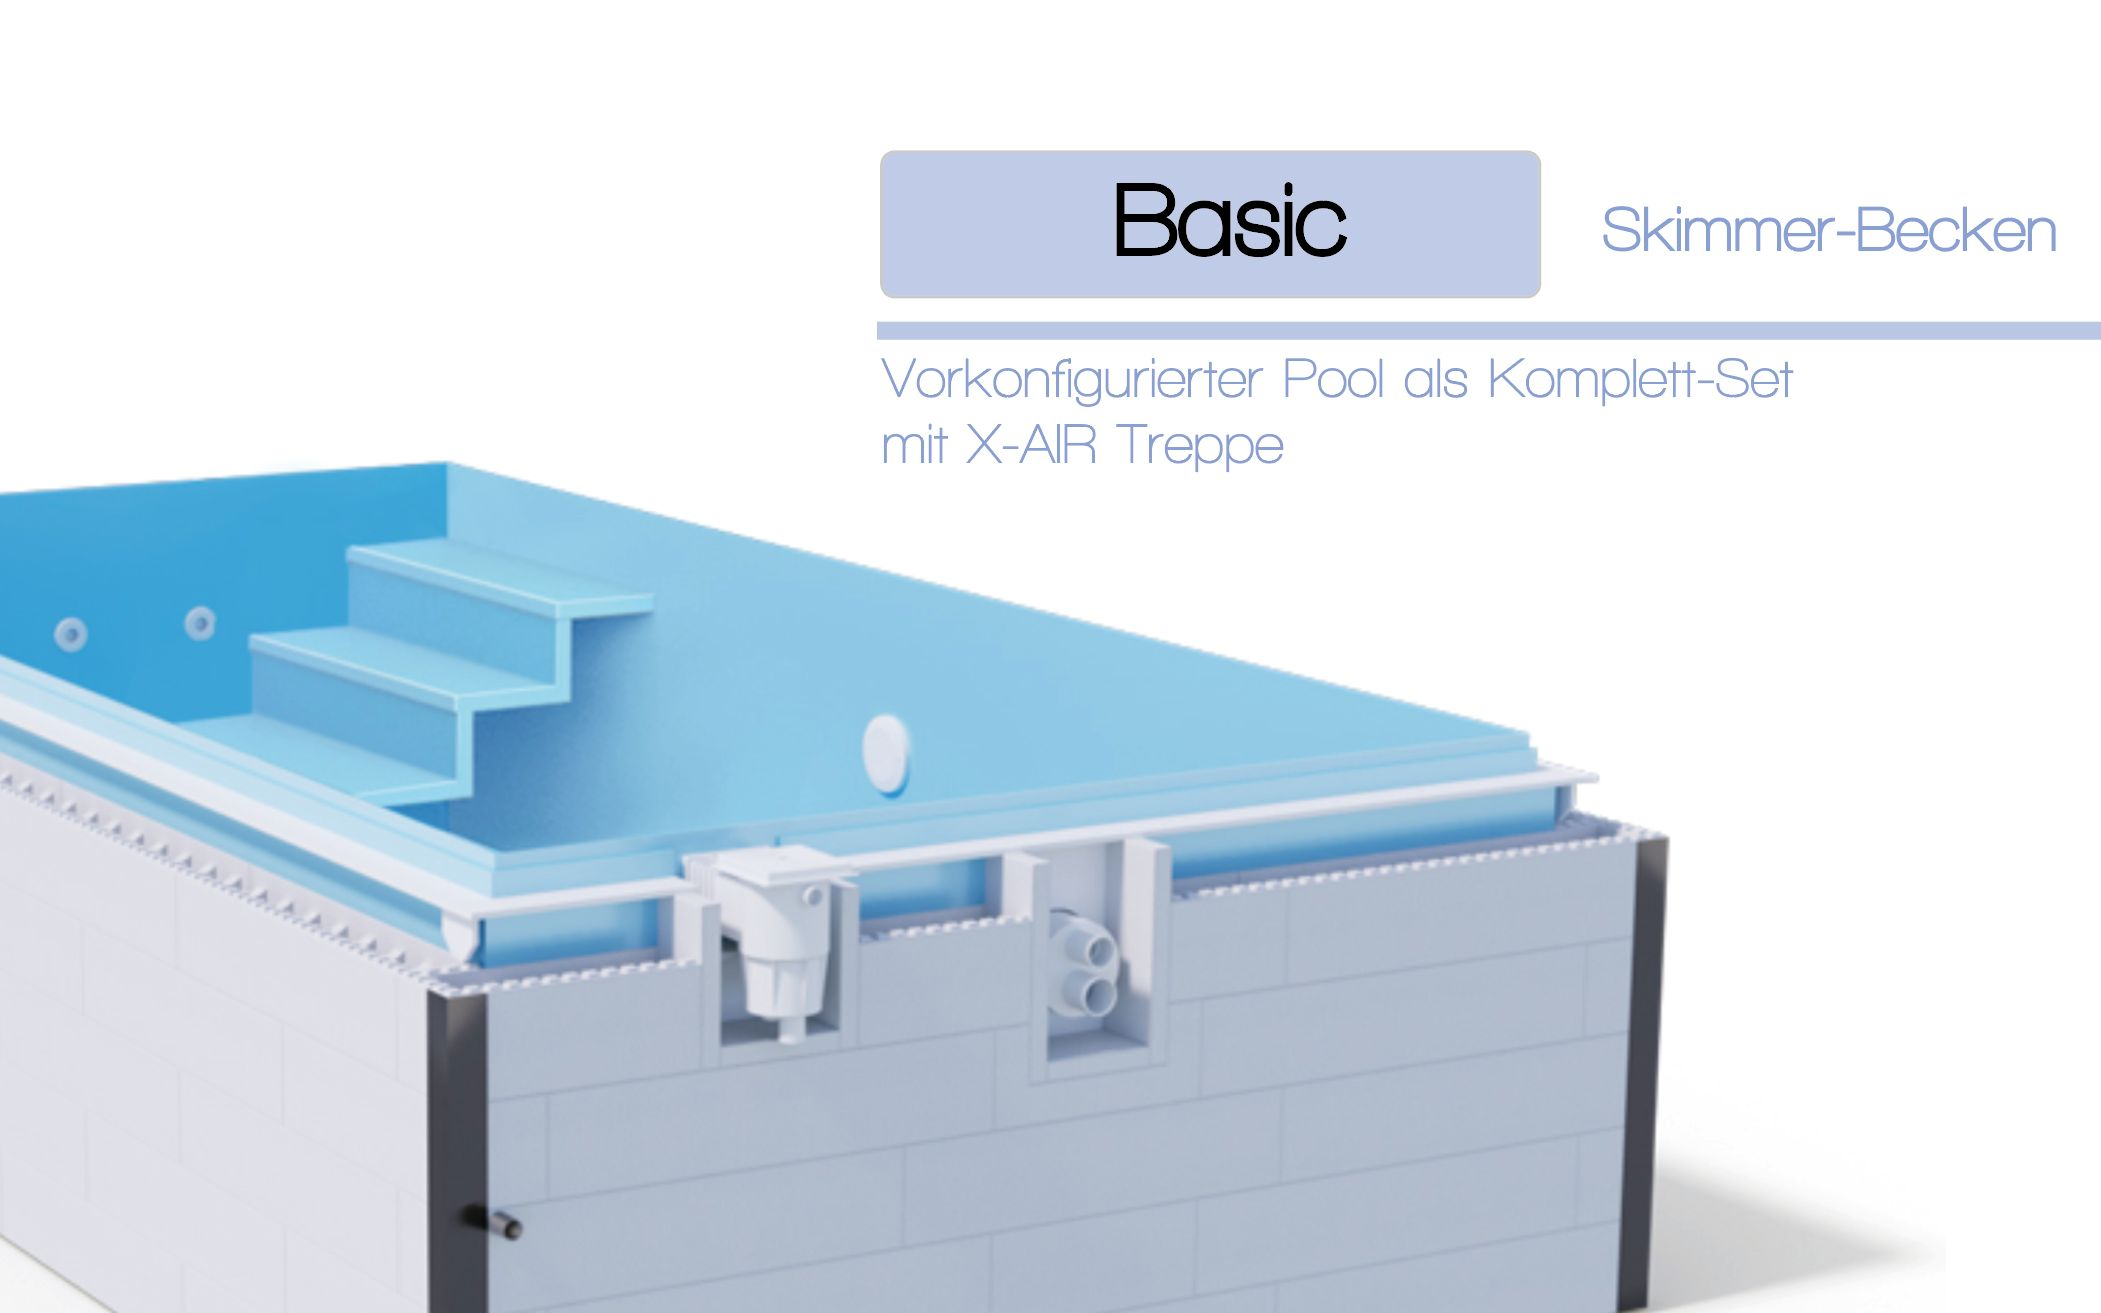 Basic - Skimmer-Becken